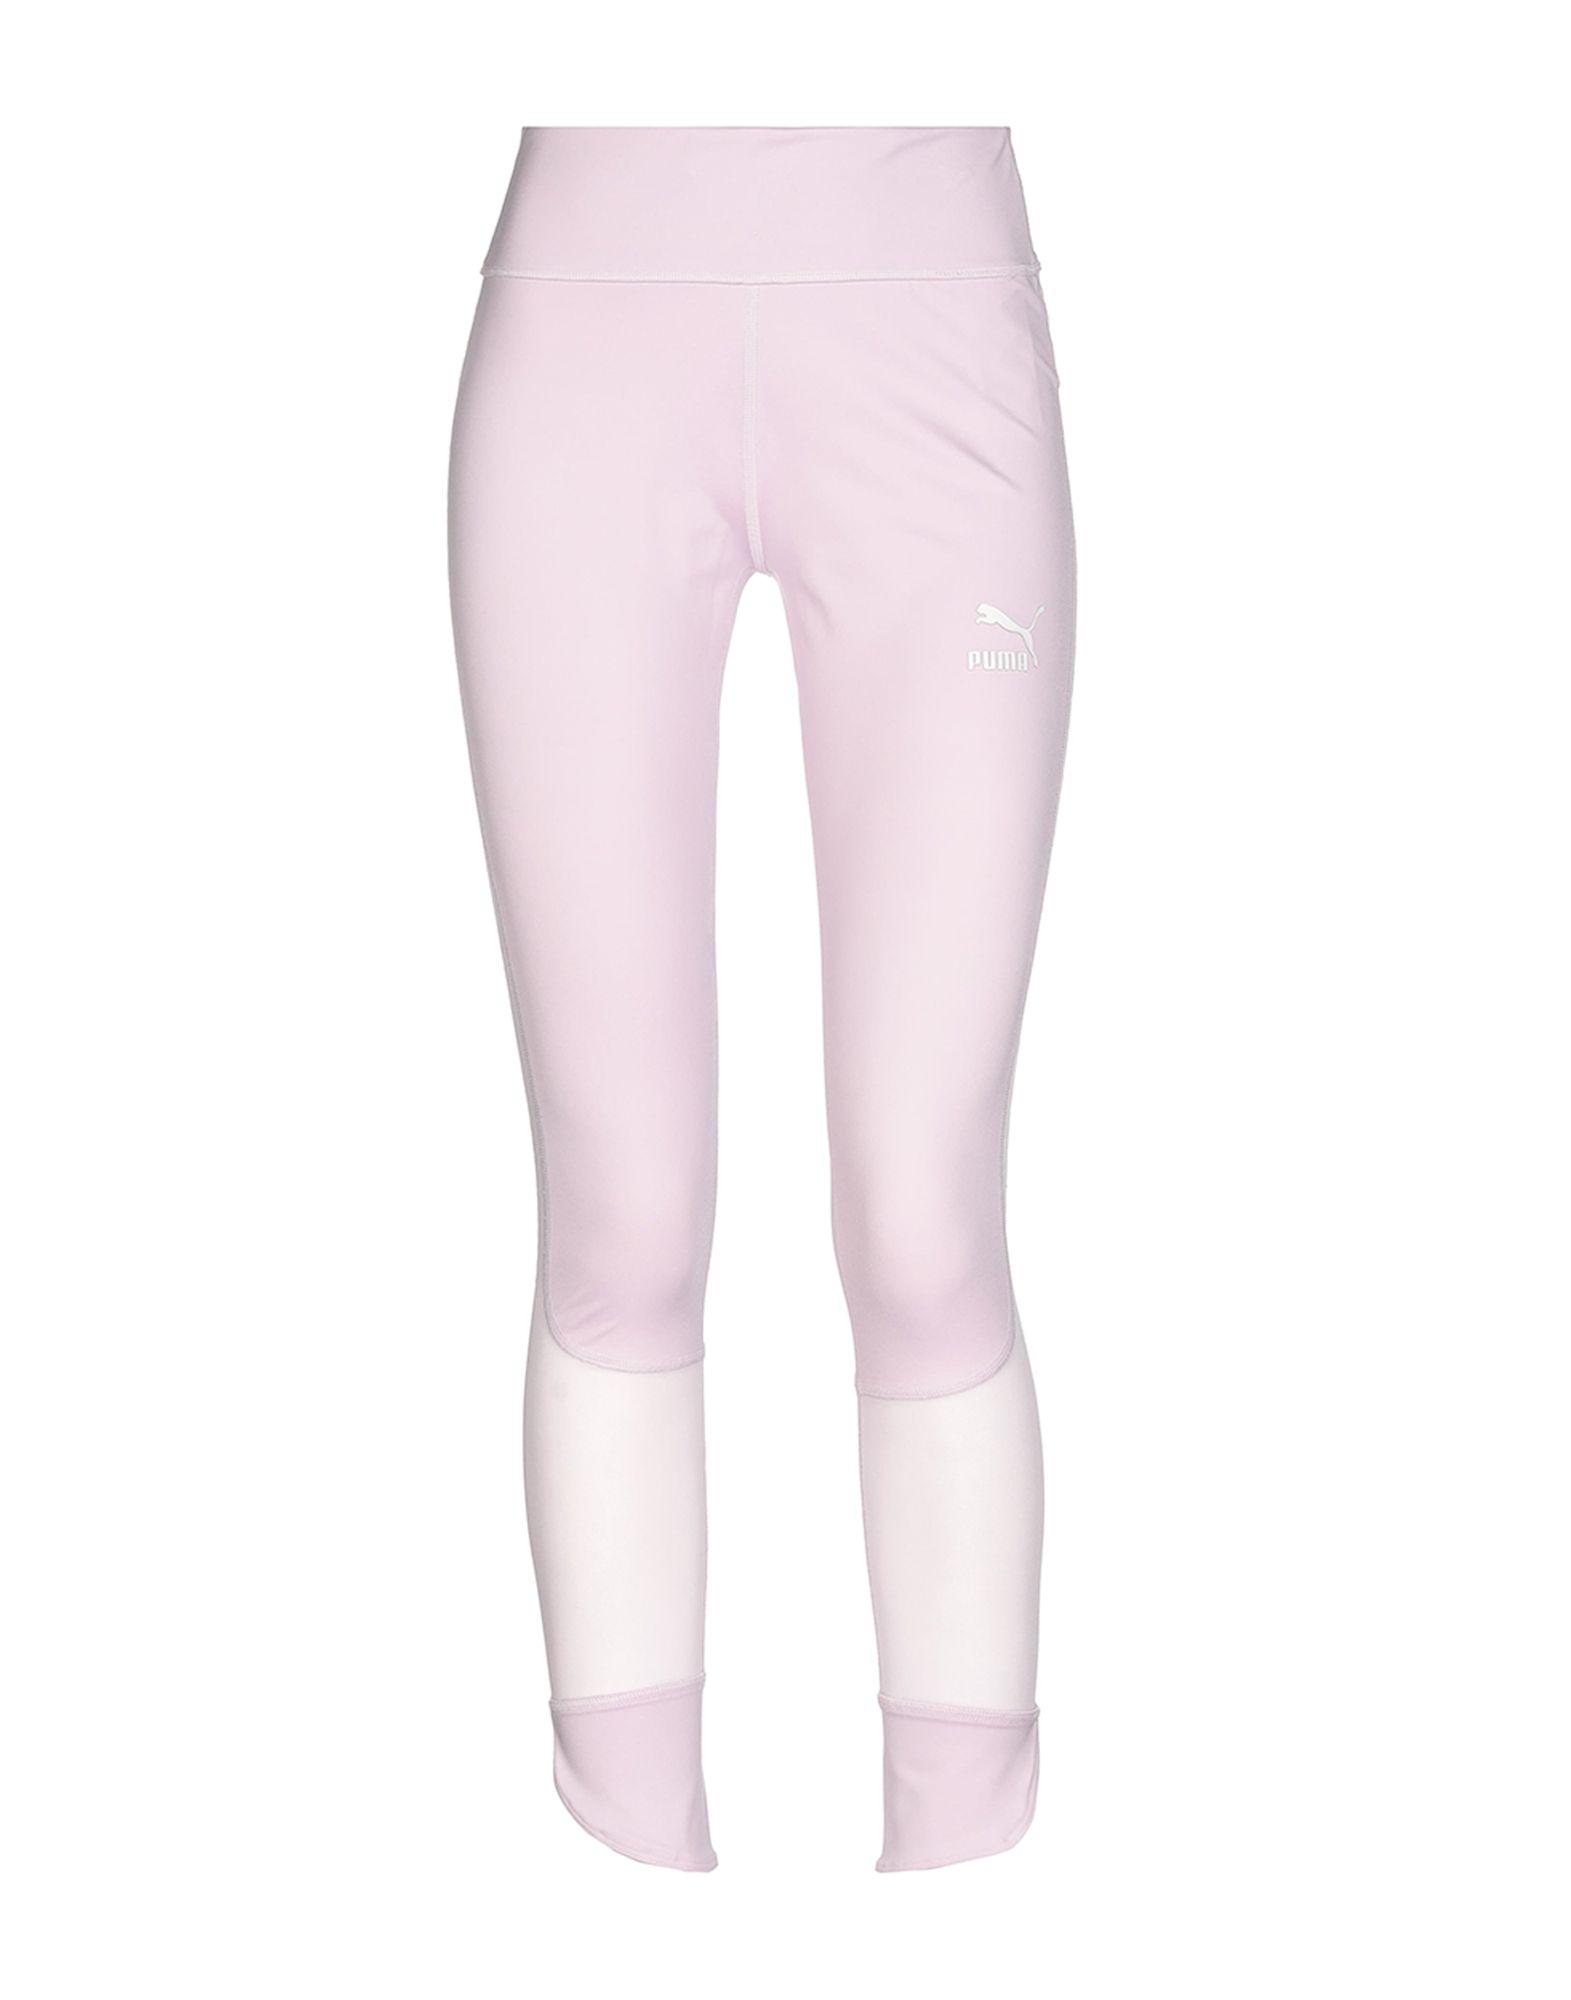 Puma Leggings In Light Pink